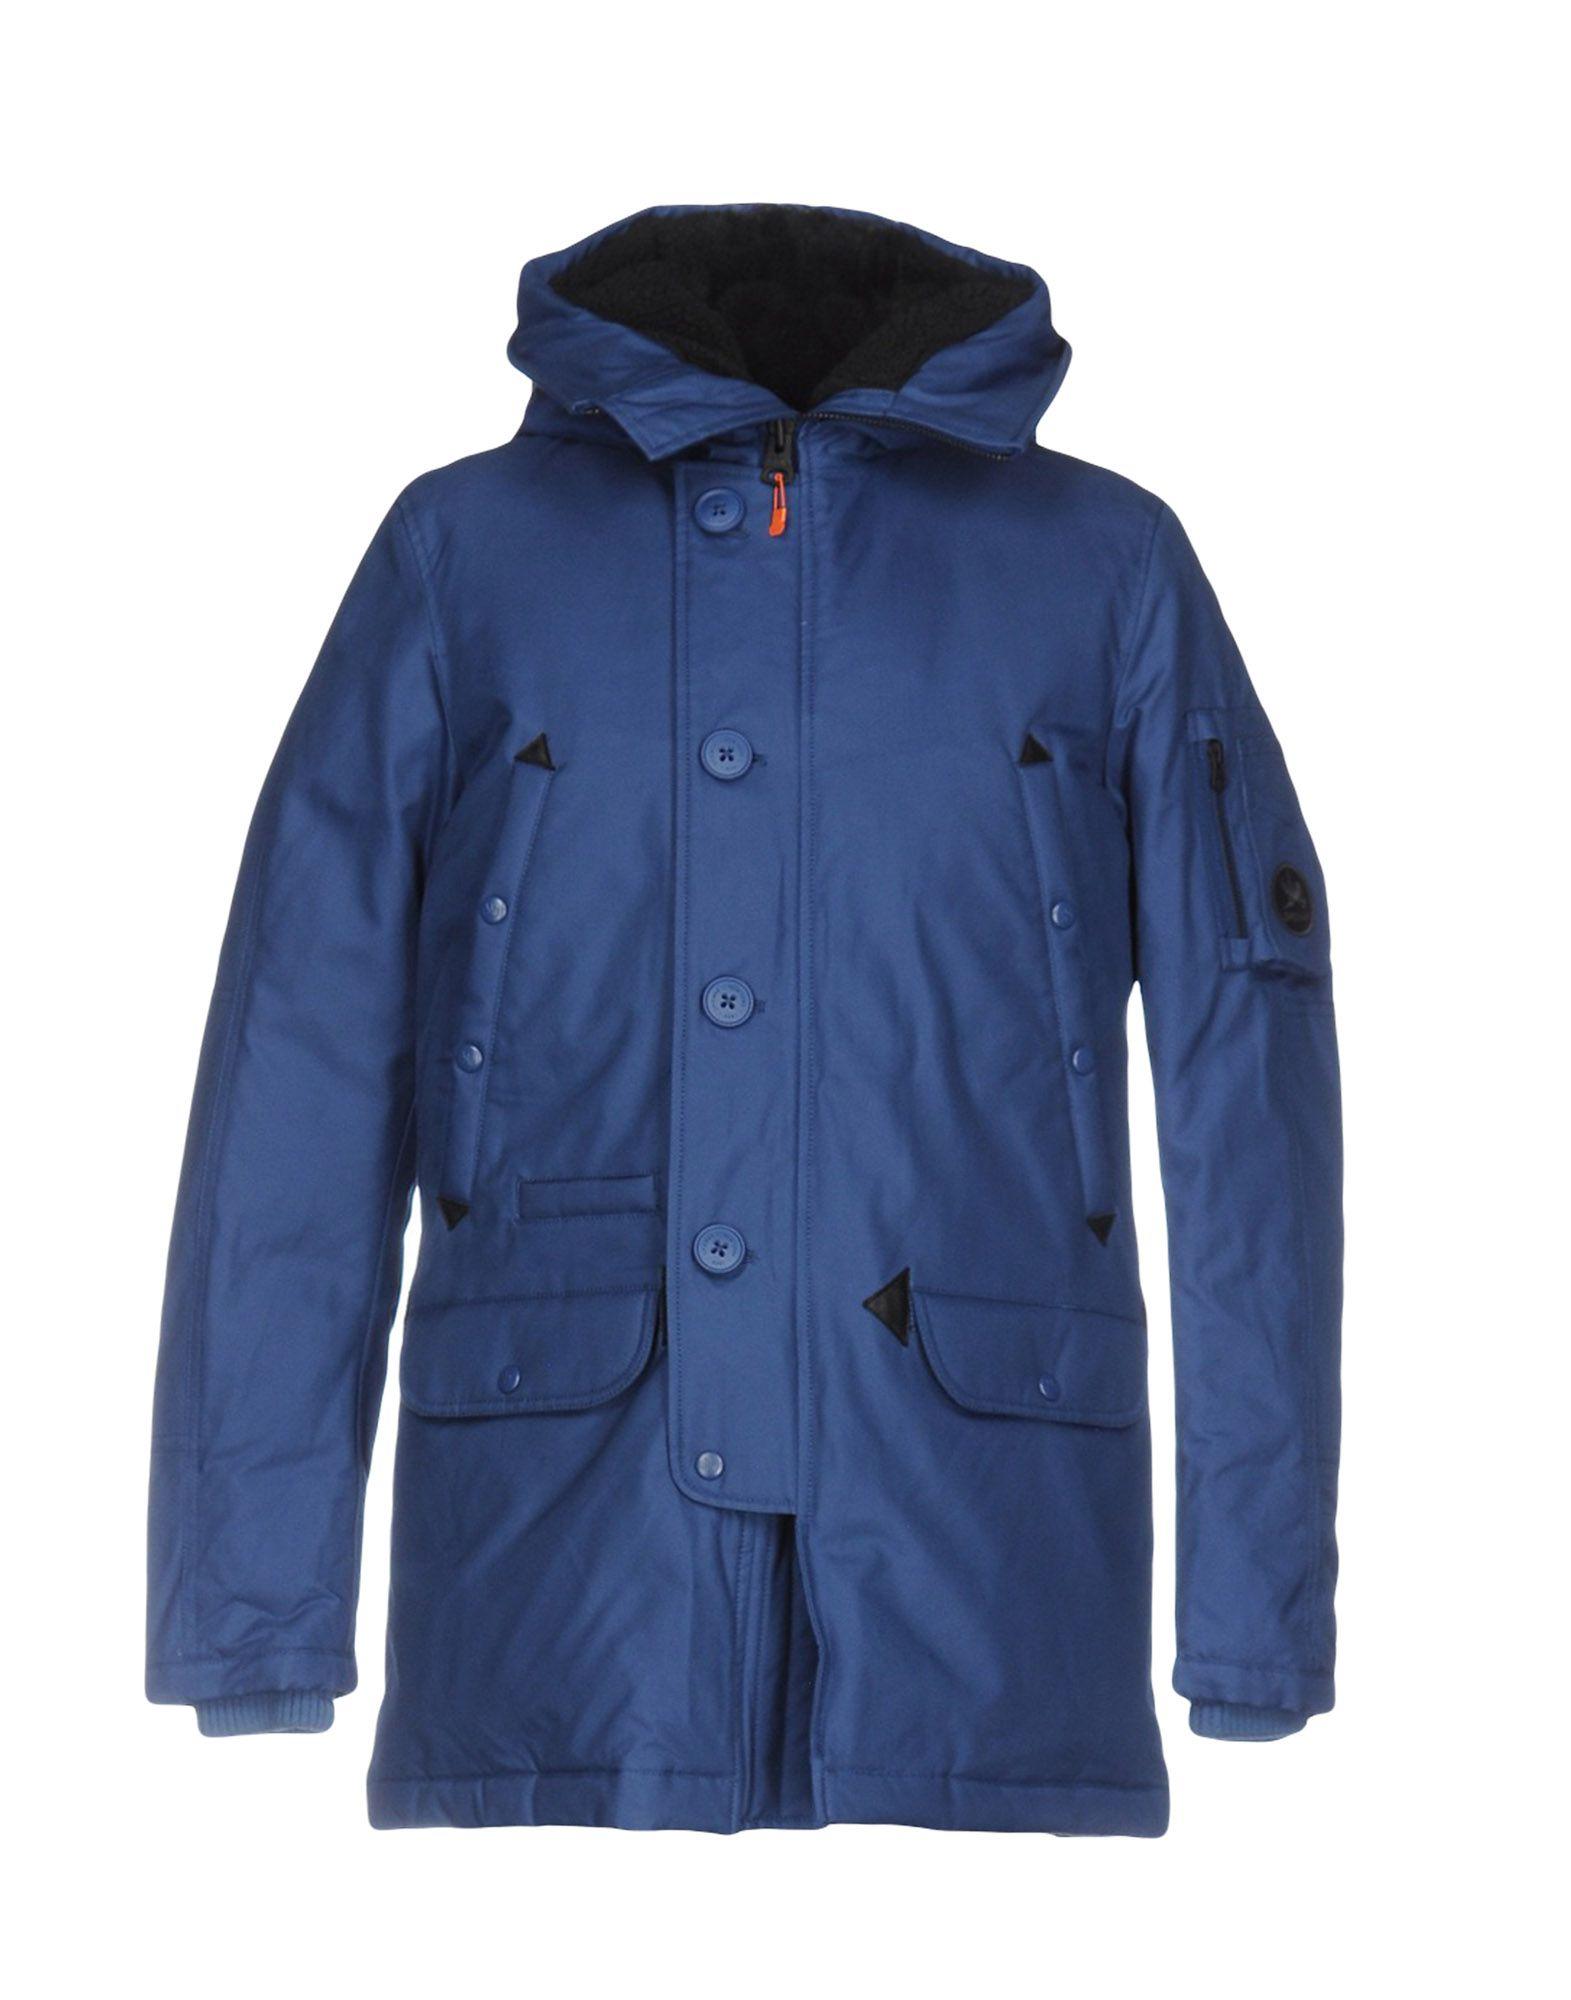 SPIEWAK Down Jacket in Blue